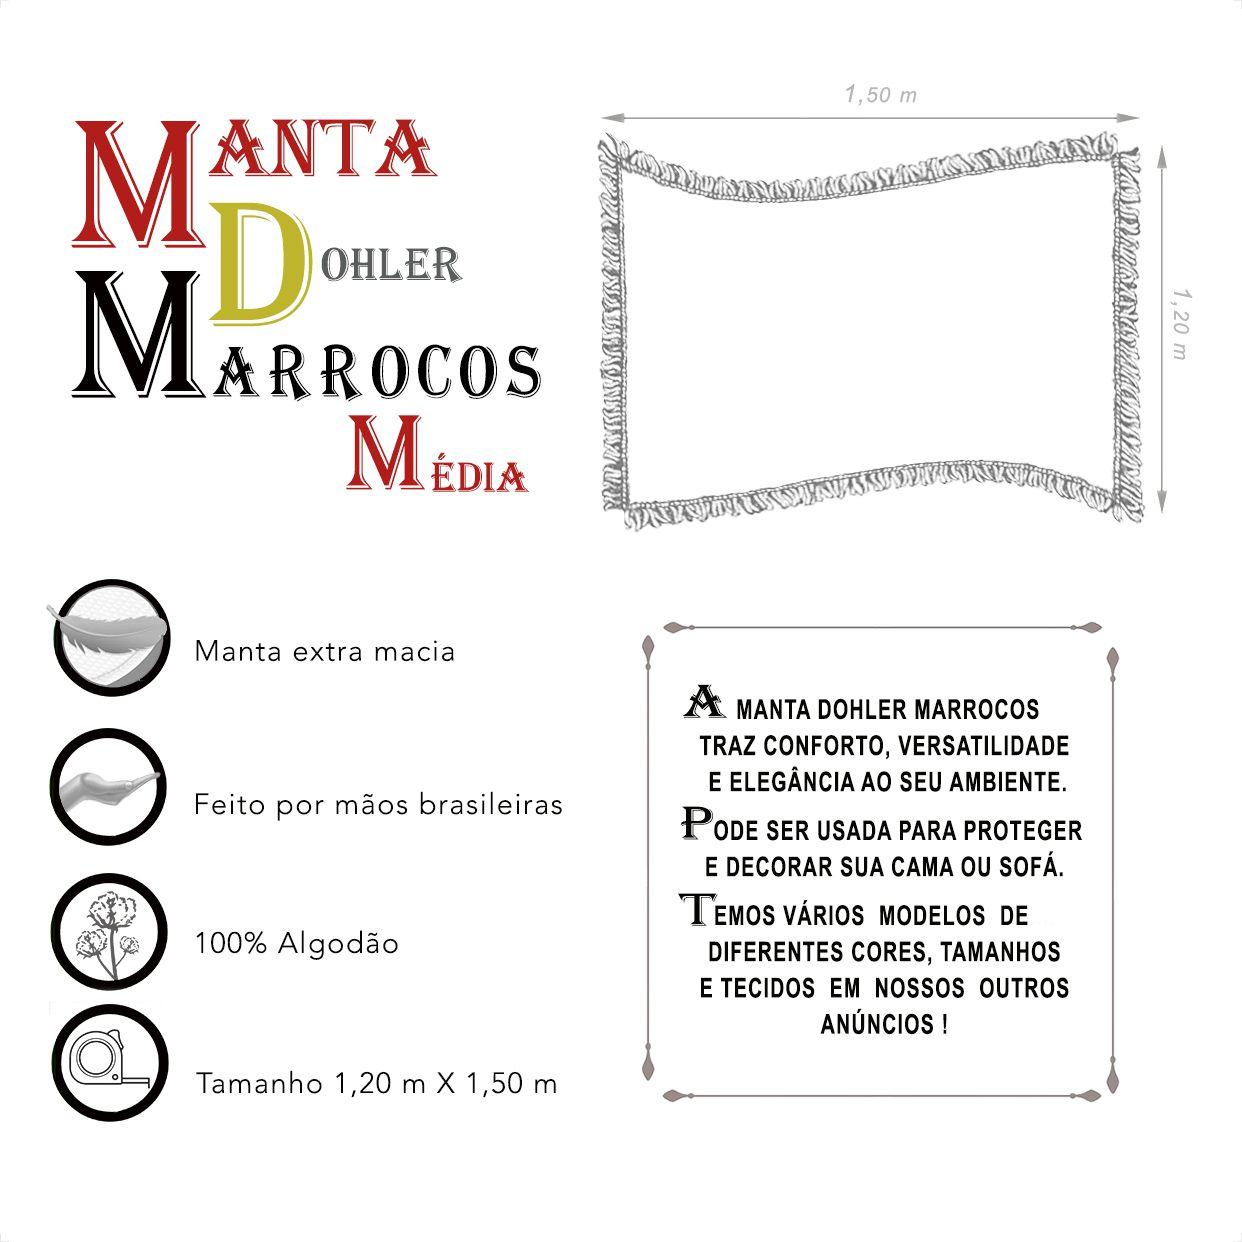 Manta Dohler Marrocos Média (1,20m x 1,50m)